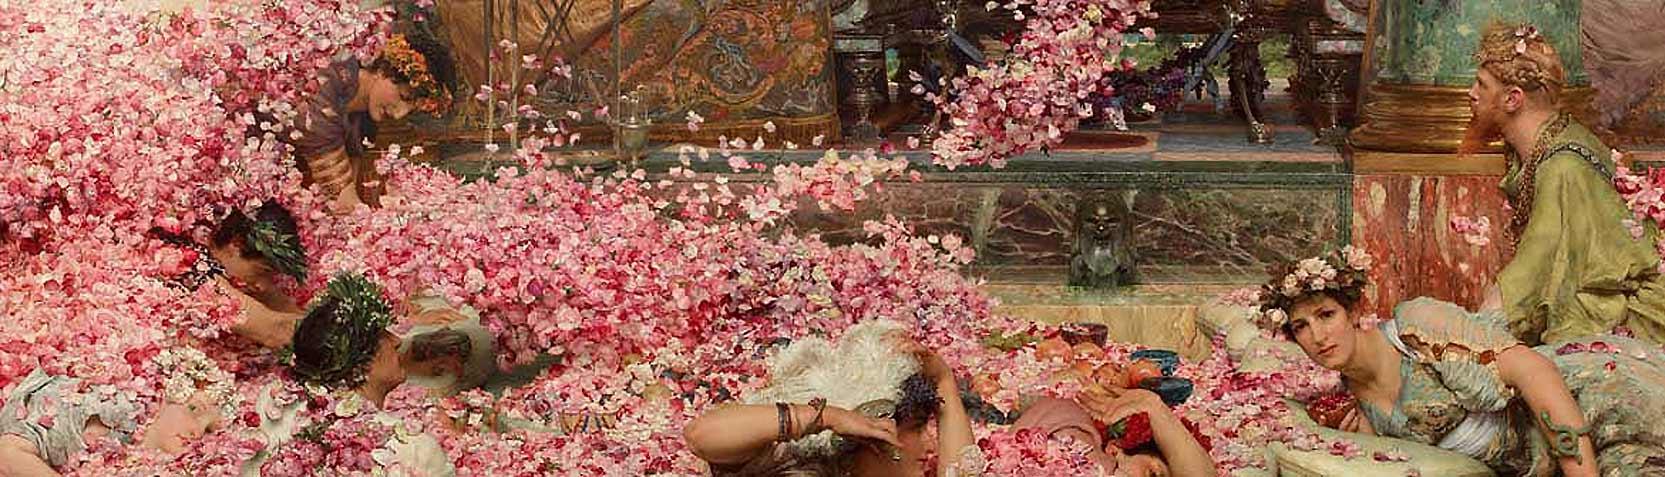 Artists - Sir Lawrence Alma-Tadema